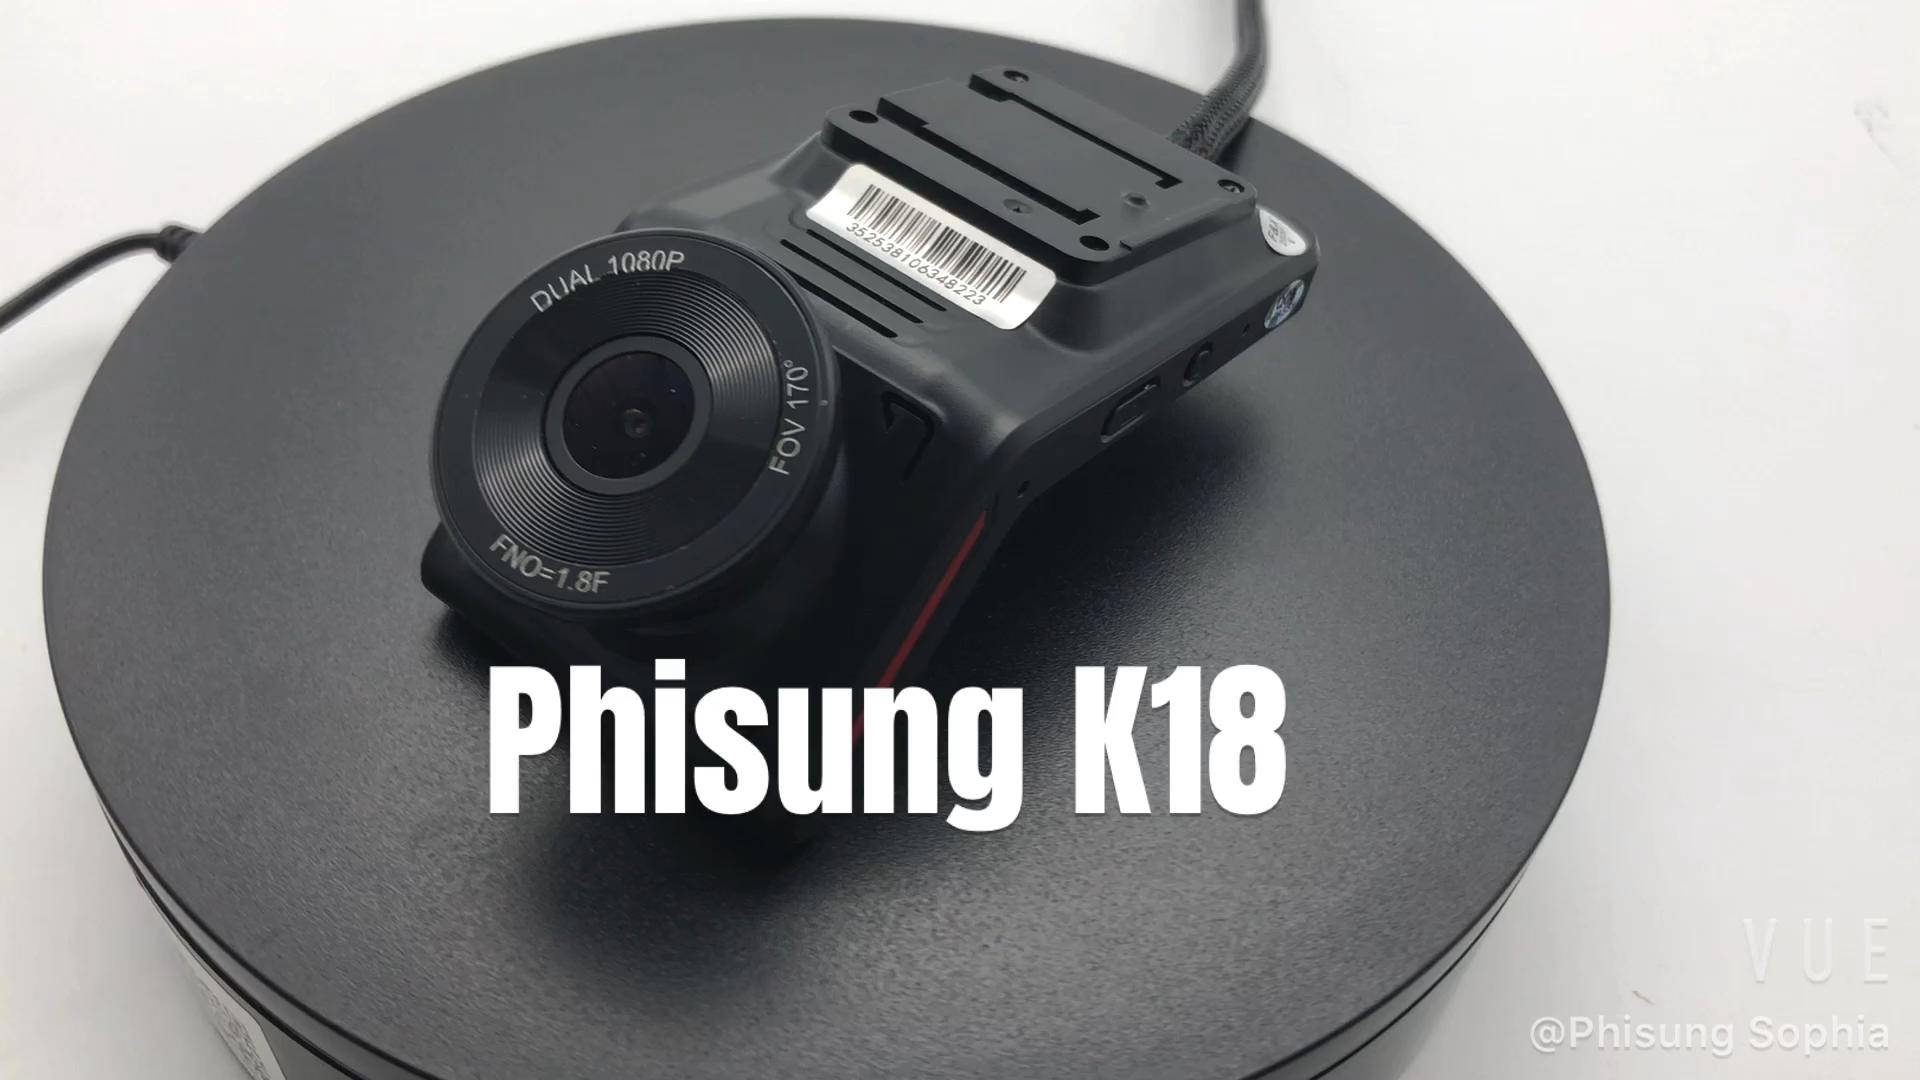 K18N 4G dash camera inside cam HD1080P GPS tracking WIFI cmsv6 for vehicle fleet live video check  night vision 360 degree